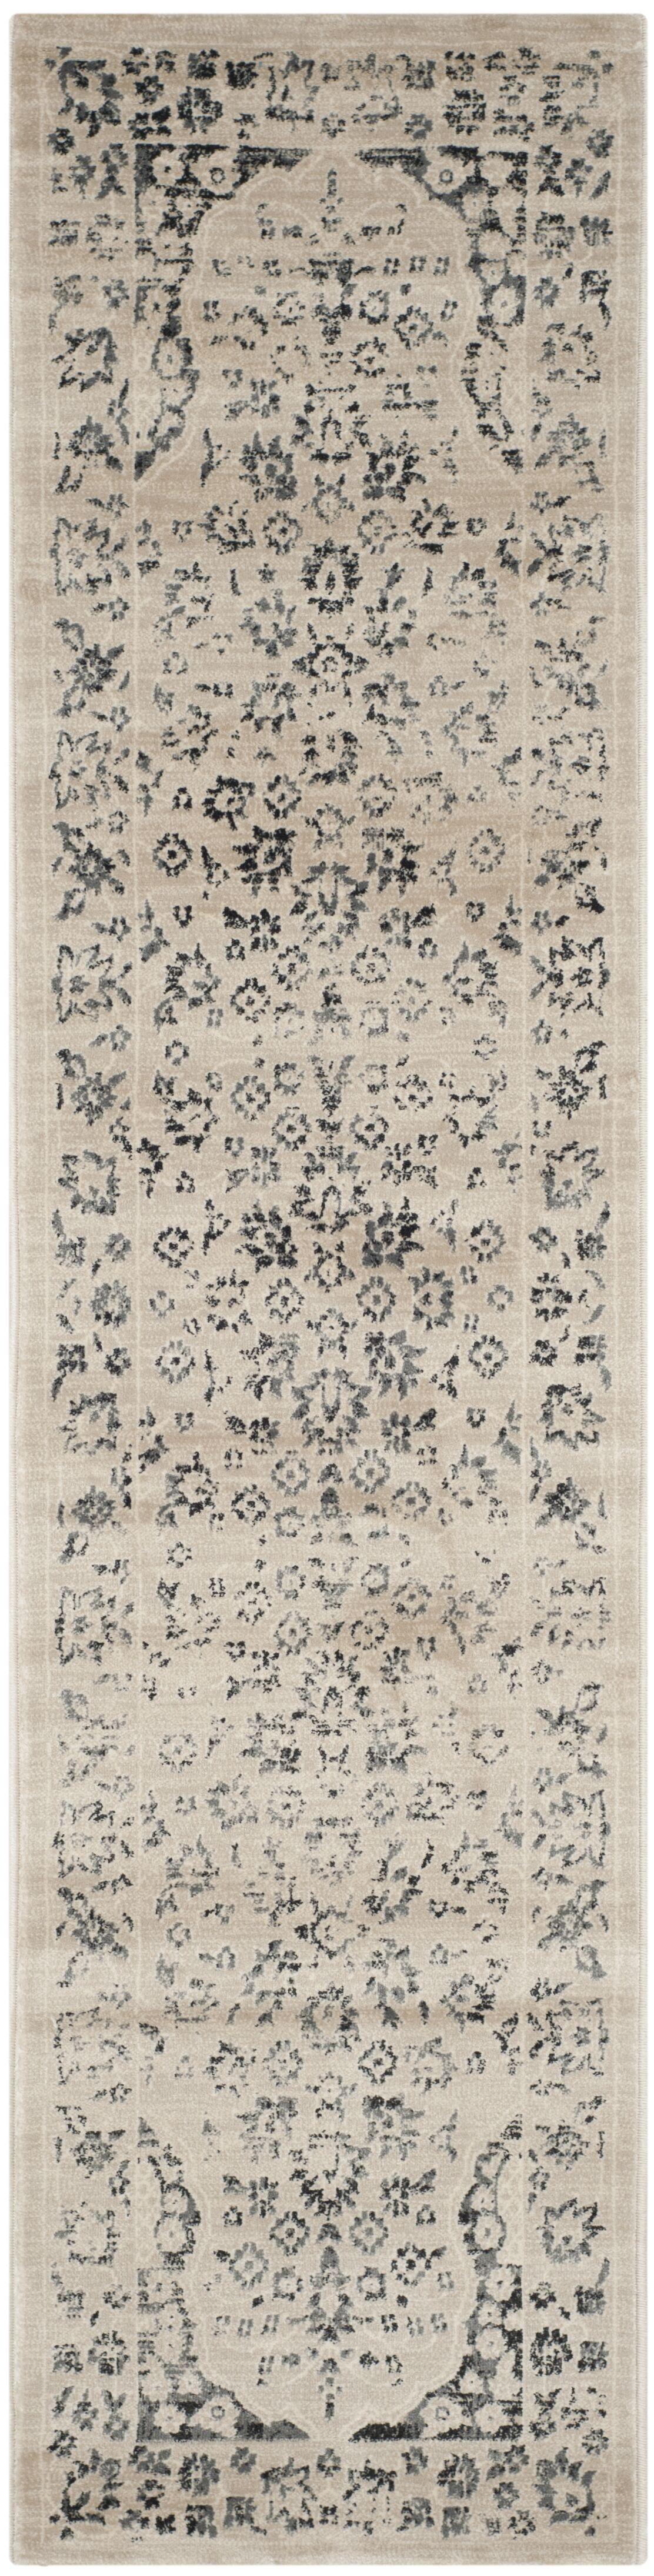 Minonk Beige/Blue Area Rug Rug Size: Rectangle 8' x 10'